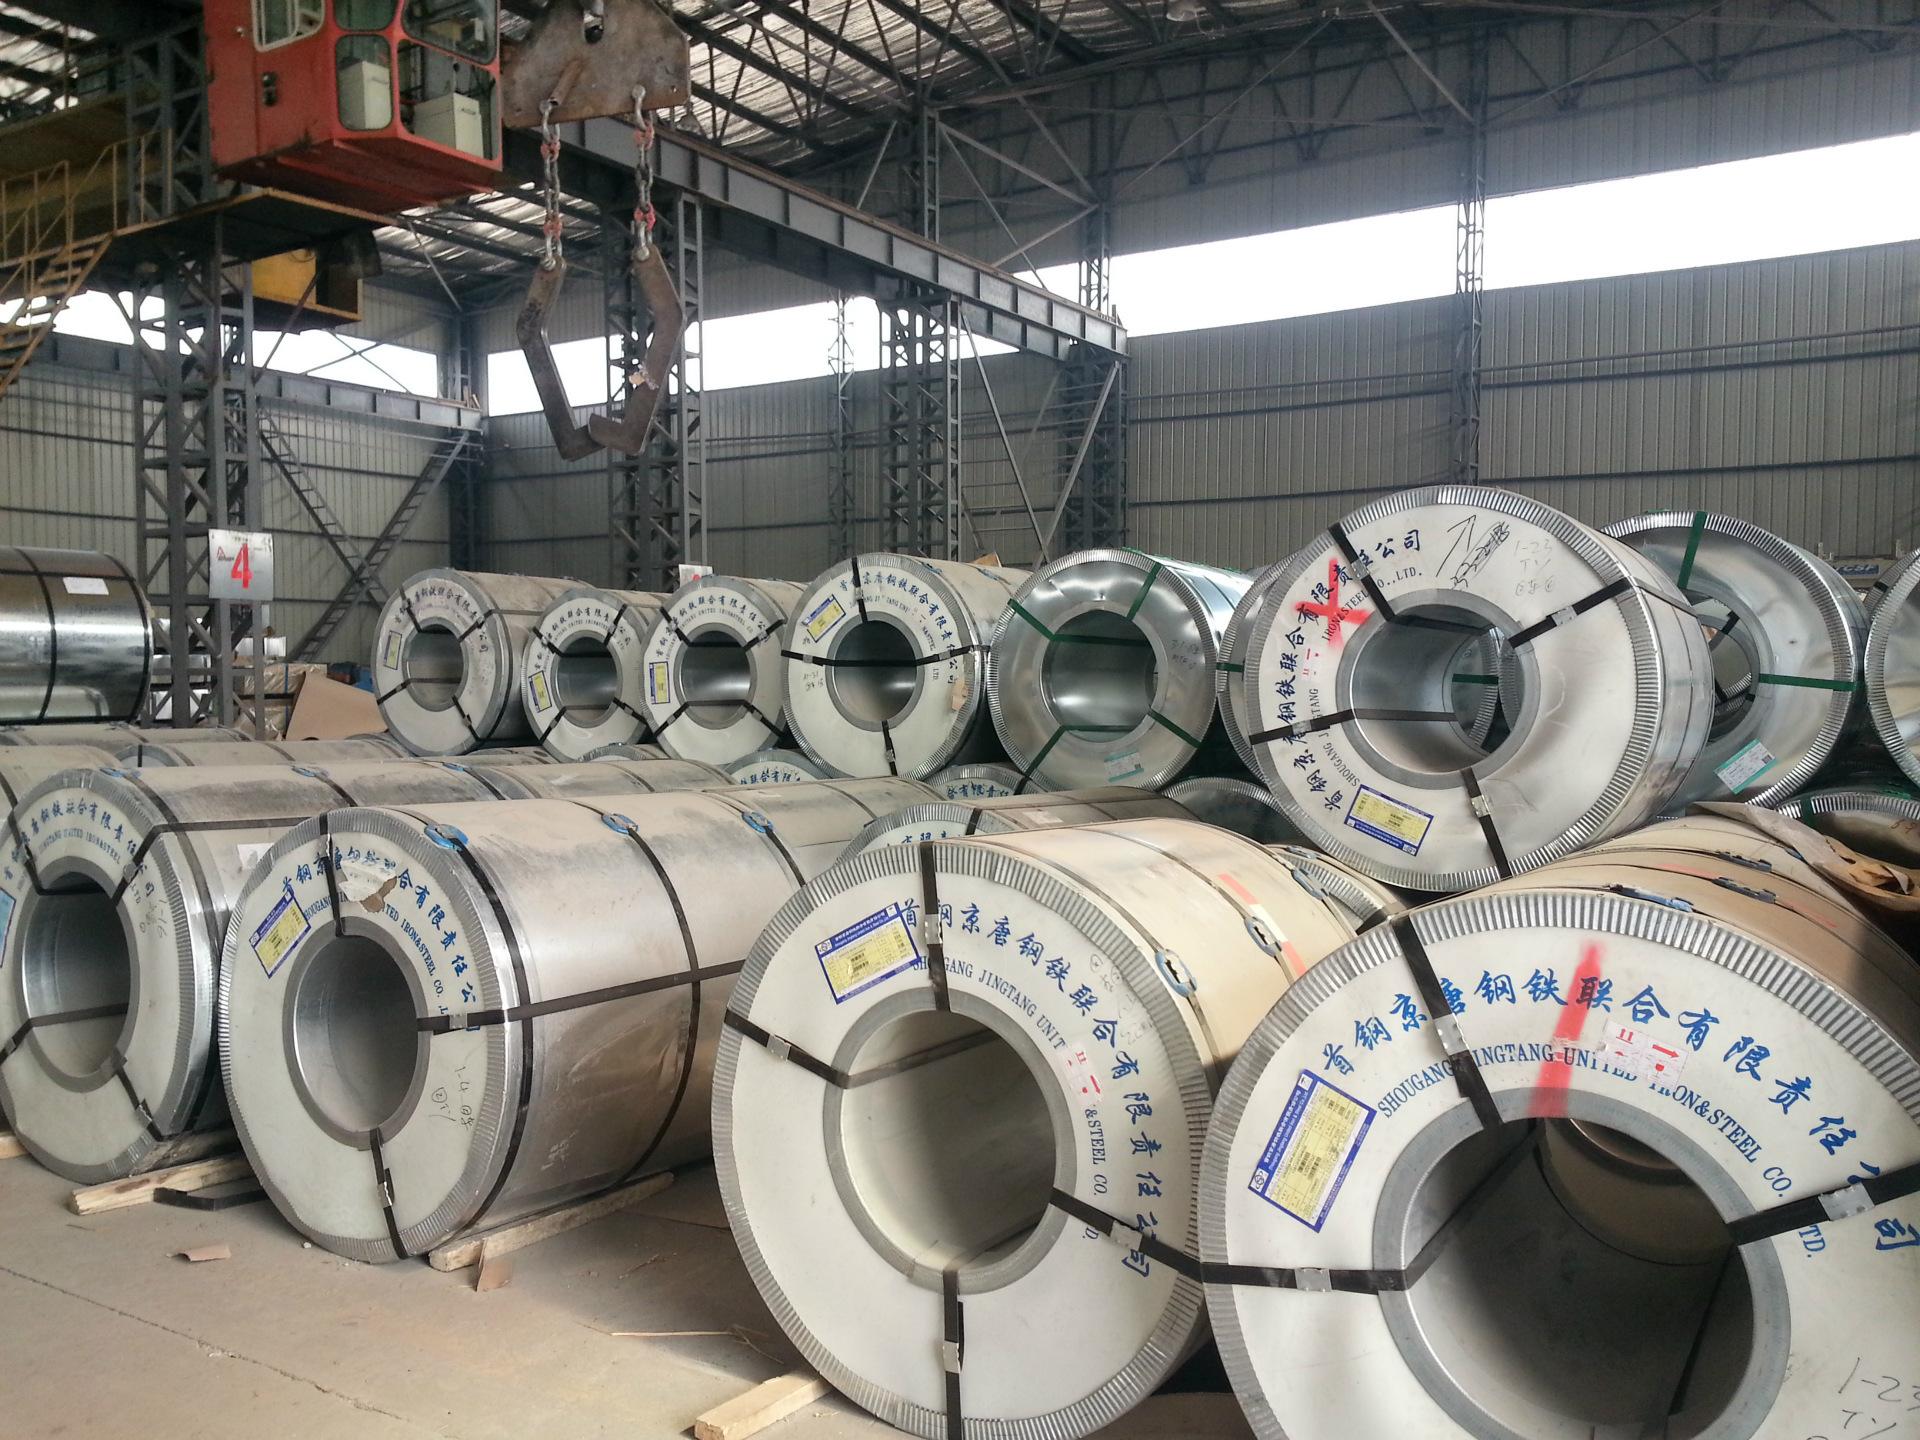 Galvanized sheet | 80 grams of zinc layer of galvanized sheet | 200 grams of zinc layer of galvanize